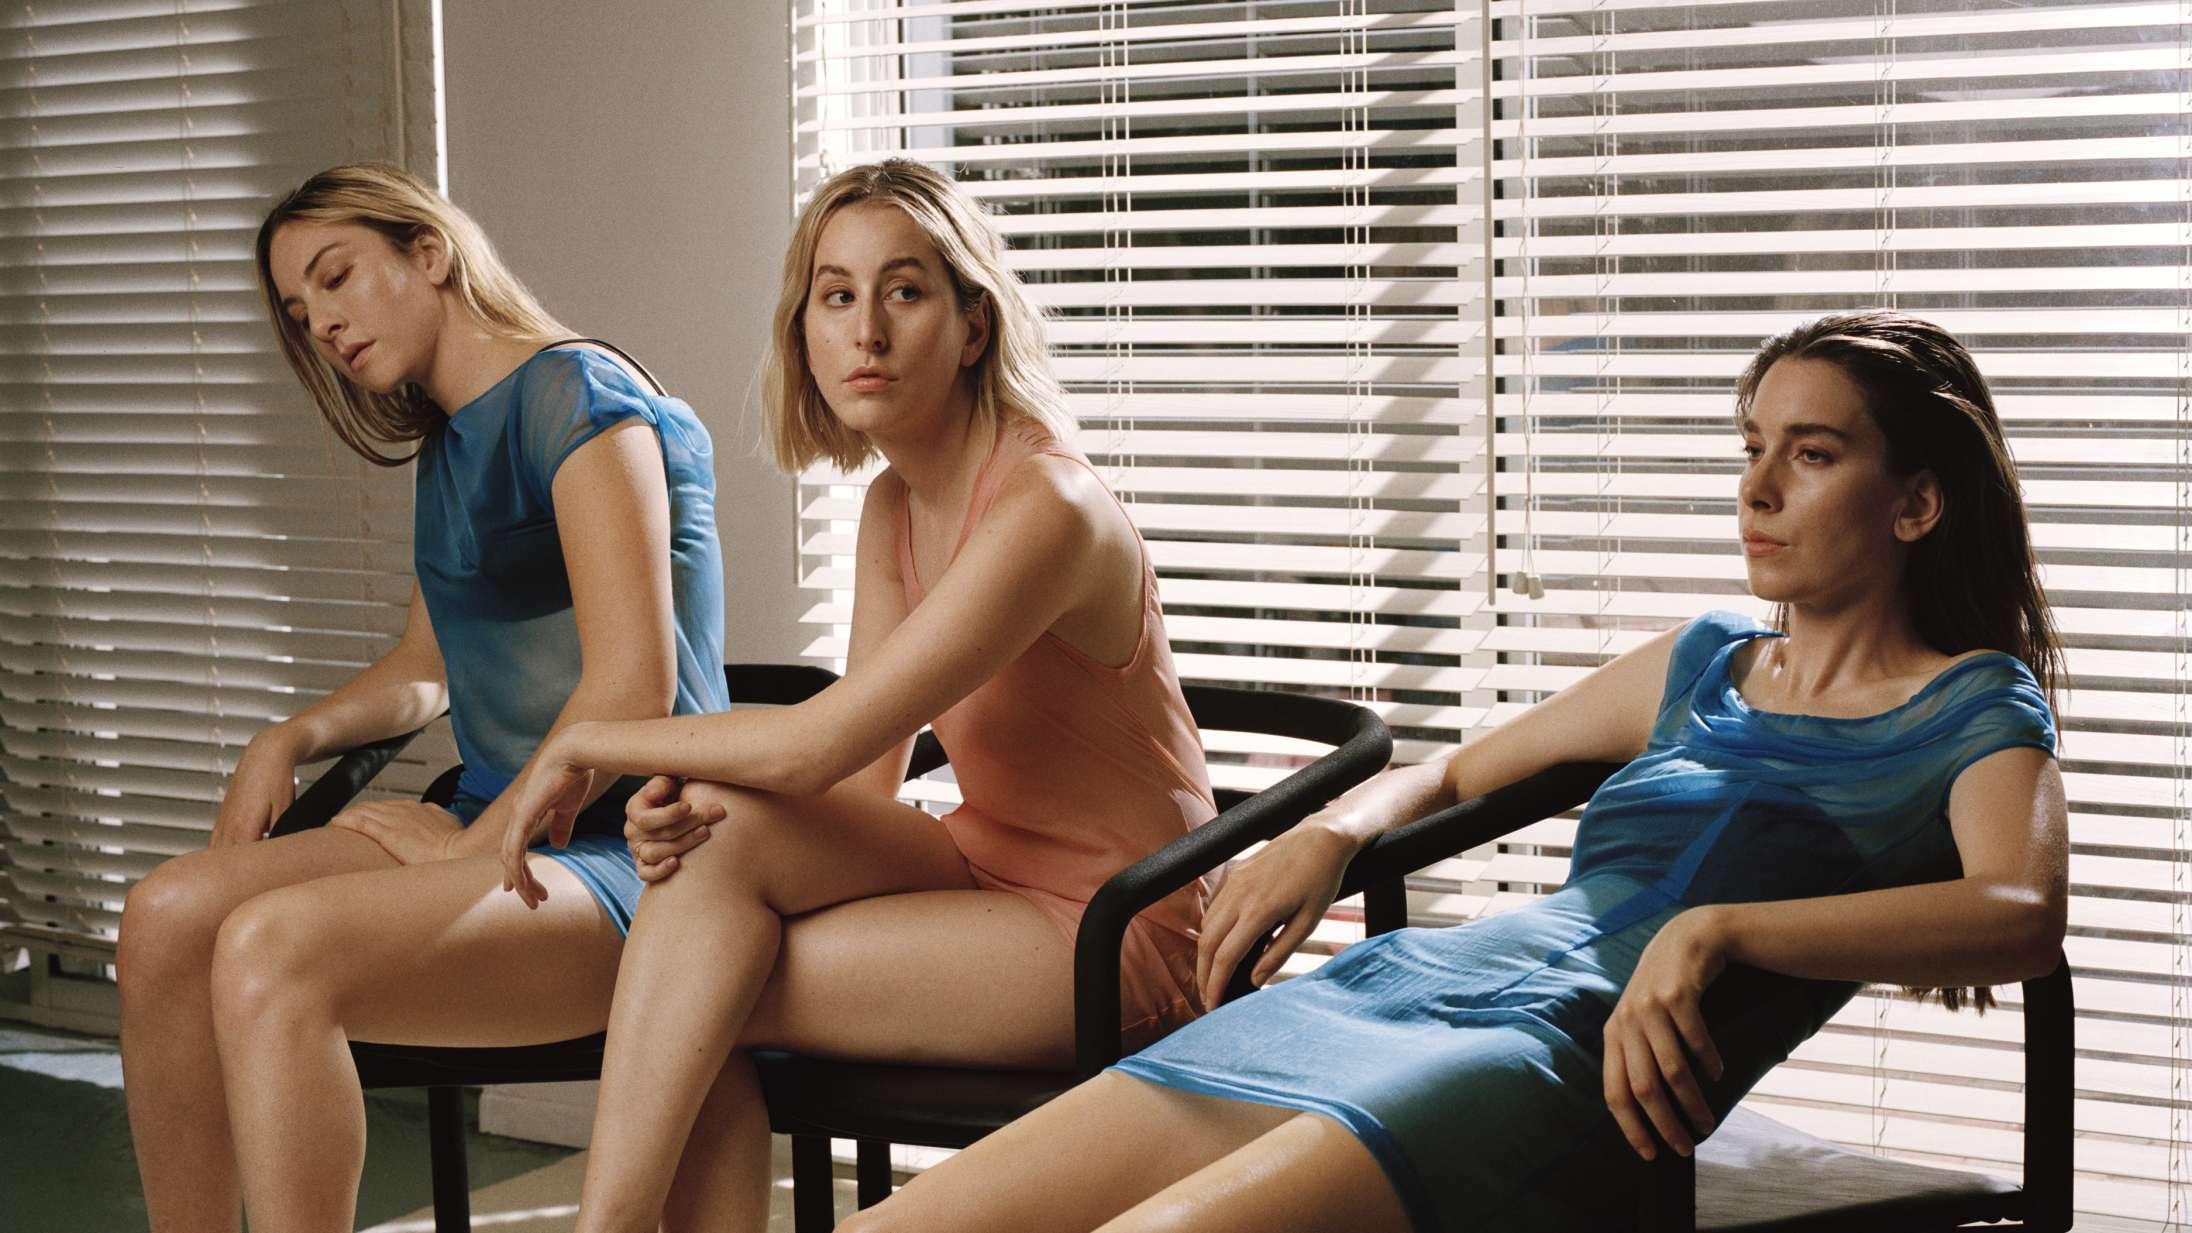 Haims 'Women in Music Pt. III' er selvsikkert, flabet og deres hidtil bedste album